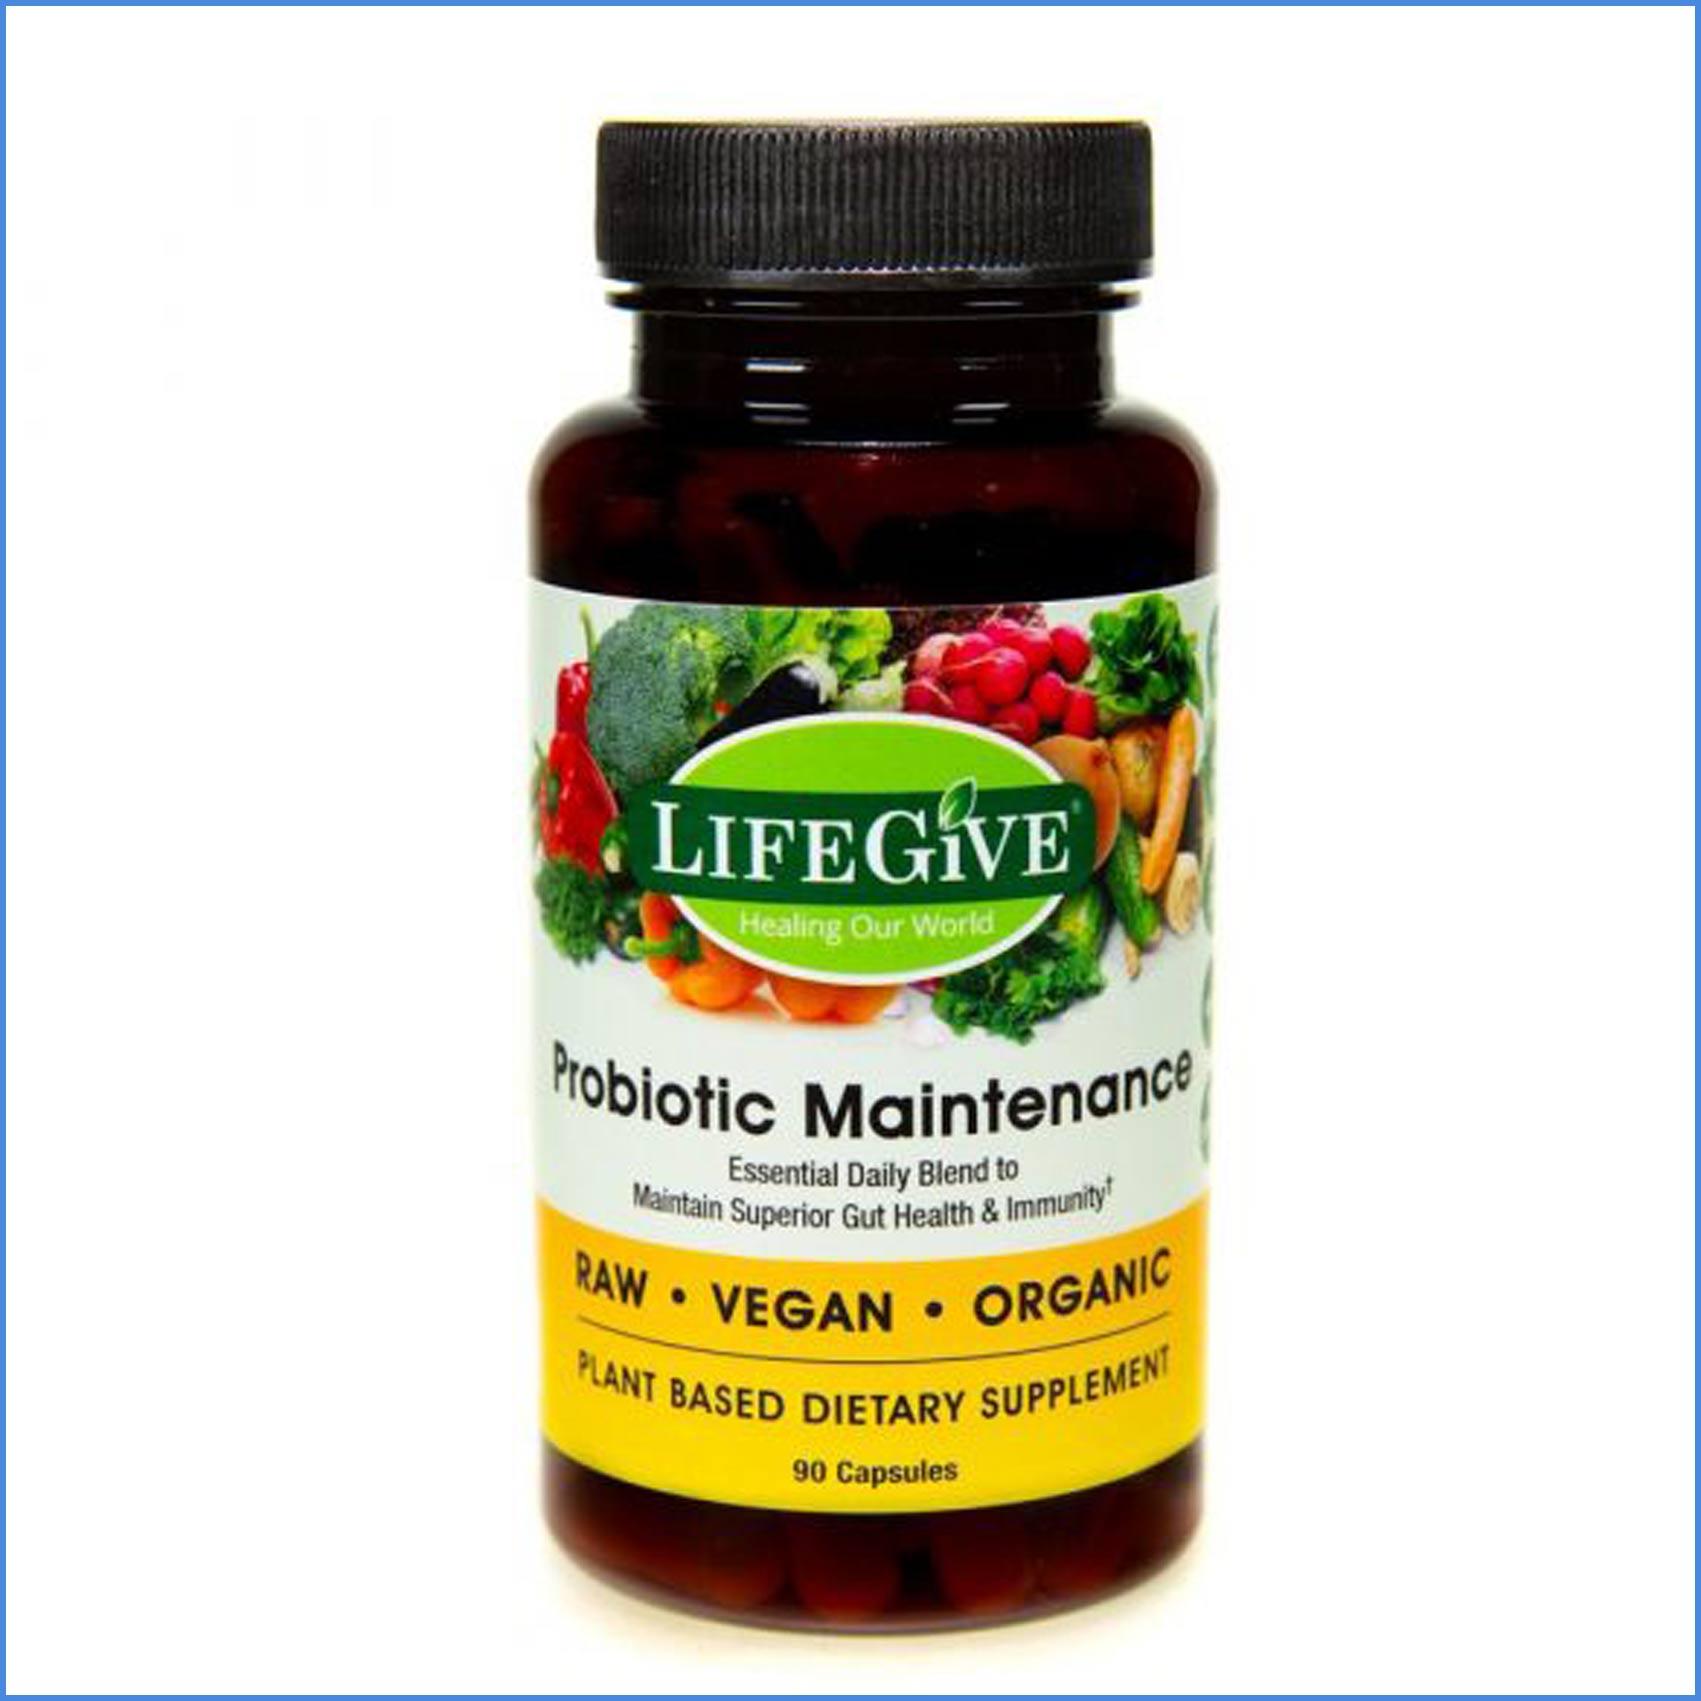 LifeGive Probiotic Maintenance 90 caps